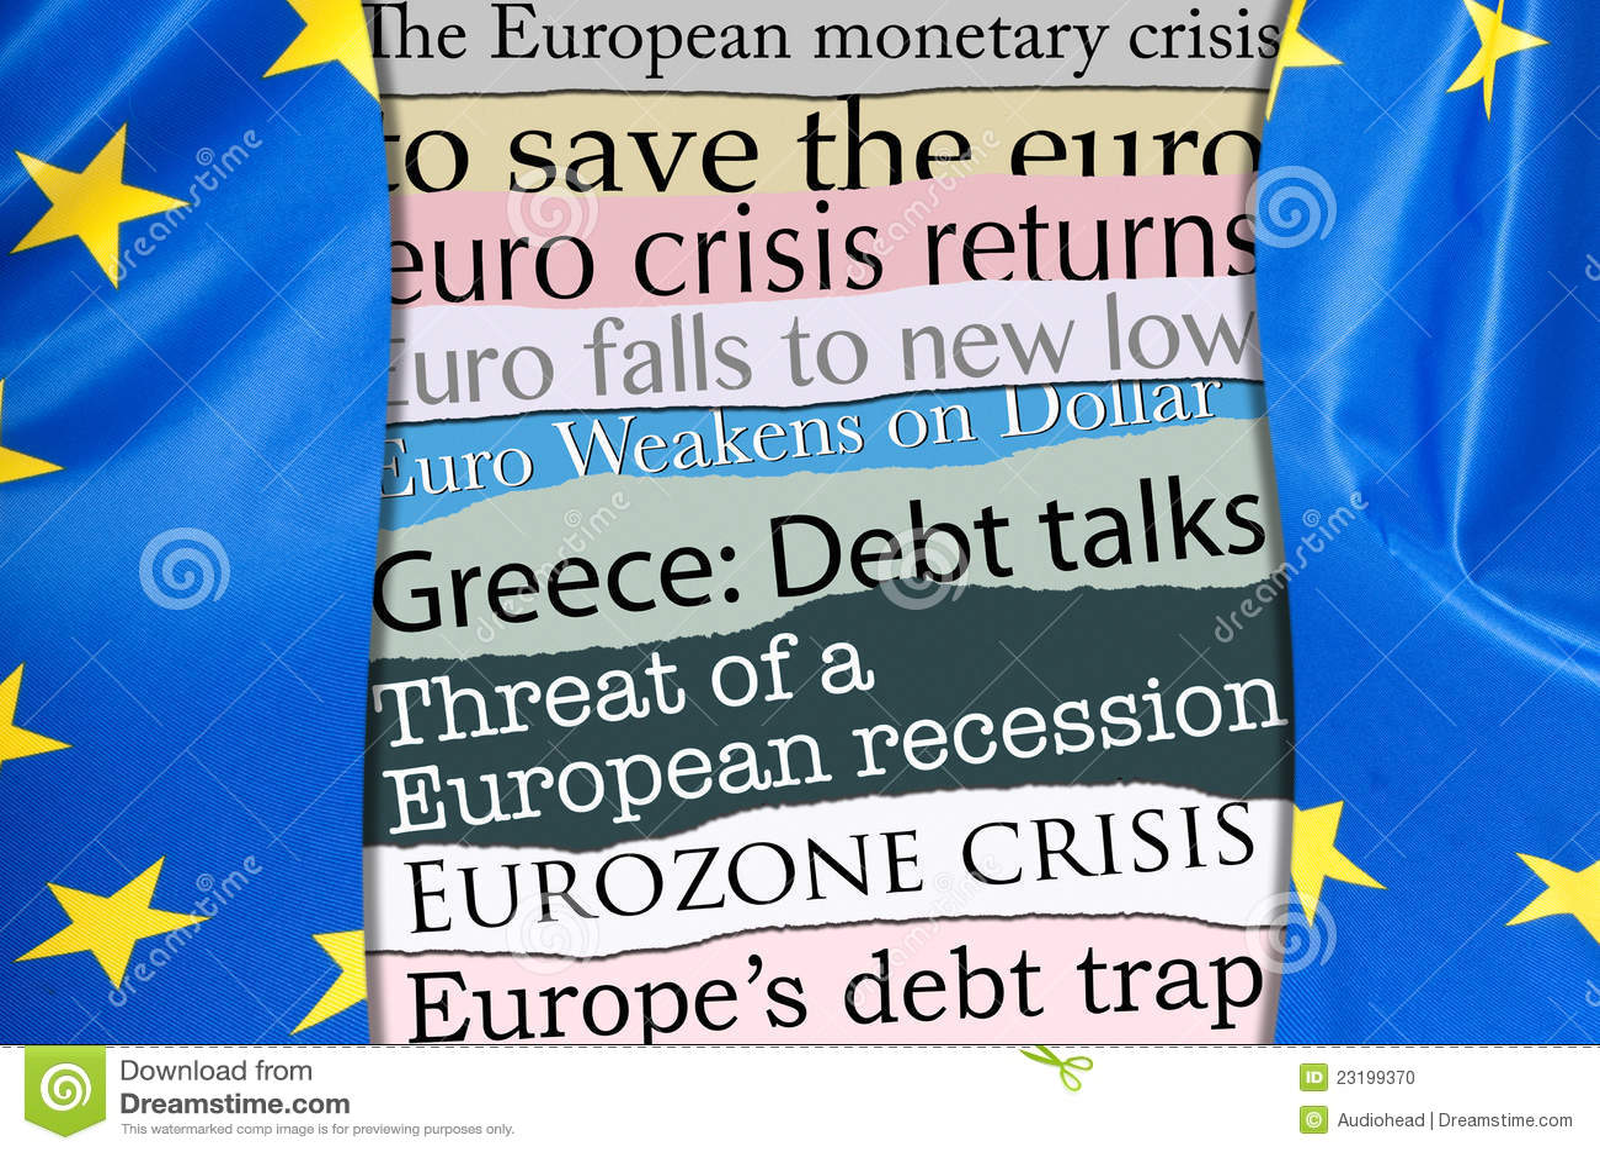 european economic and monetary union essay